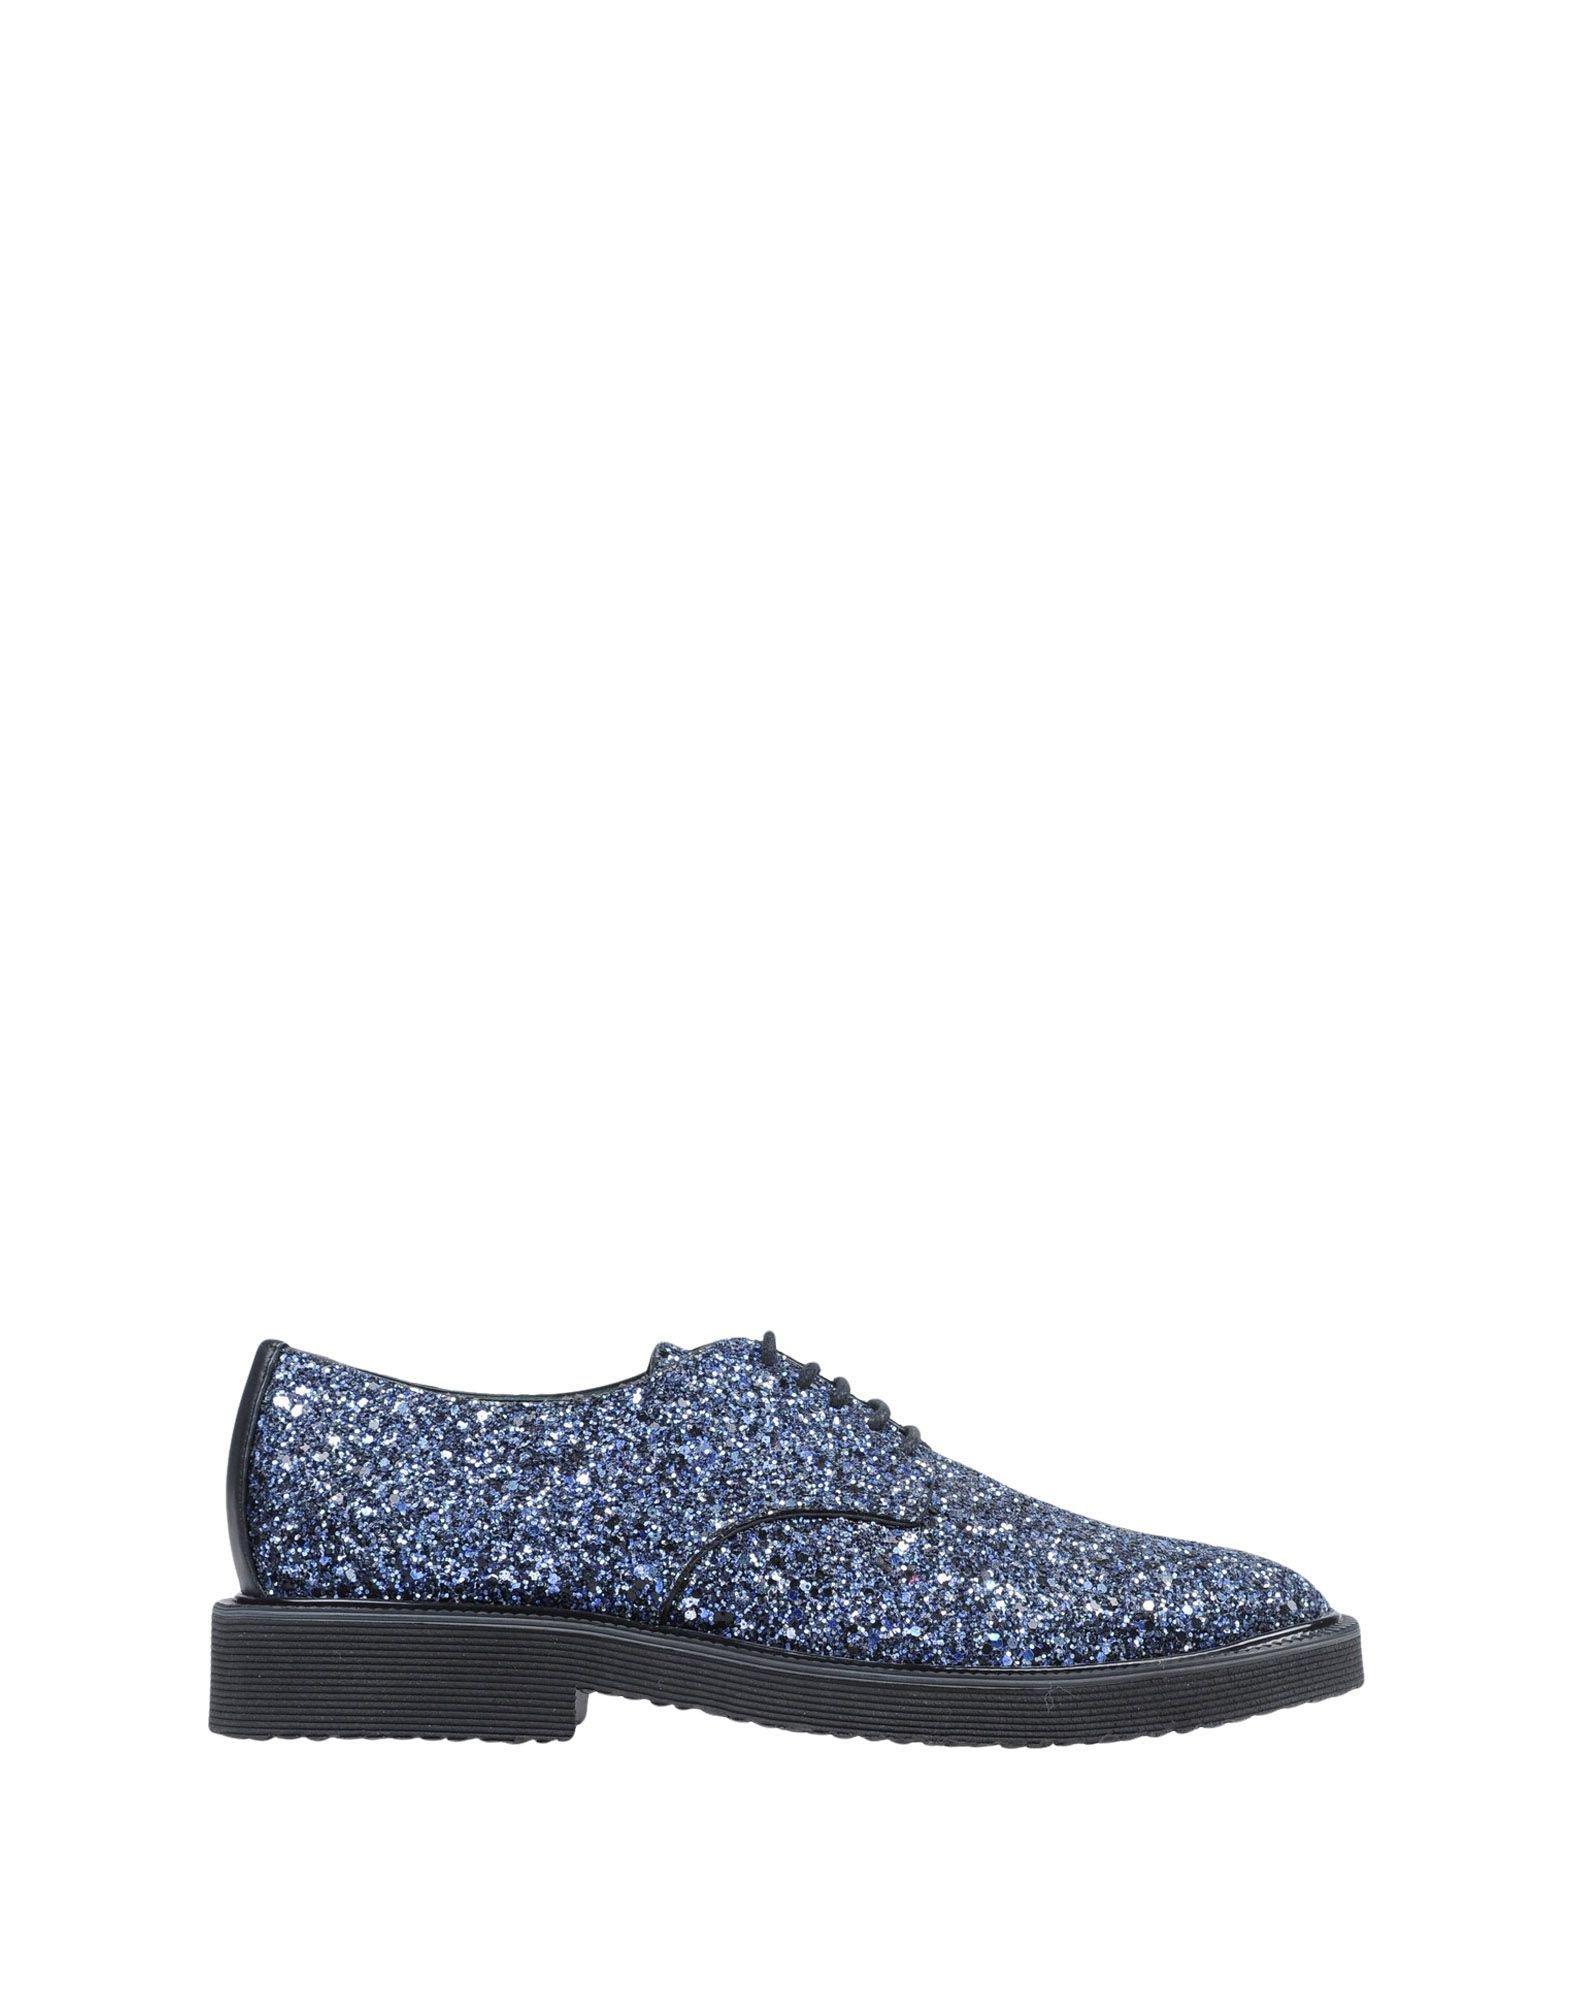 Giuseppe Zanotti Leather Lace-up Shoe in Dark Purple (Purple) for Men